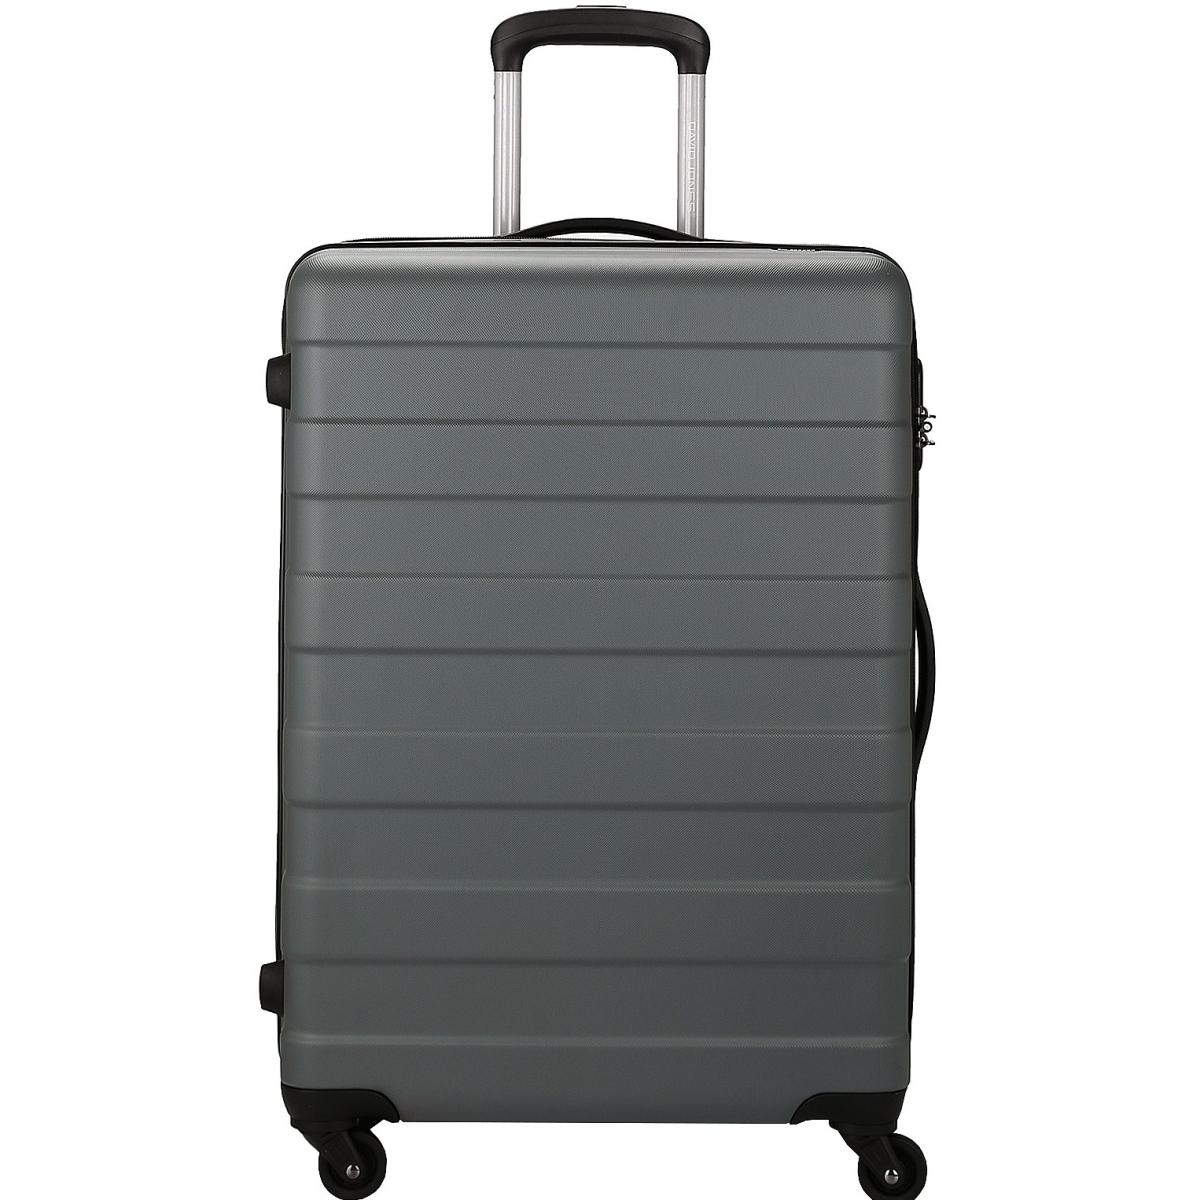 valise rigide david jones 66cm ba10161m couleur principale d grey promotion. Black Bedroom Furniture Sets. Home Design Ideas